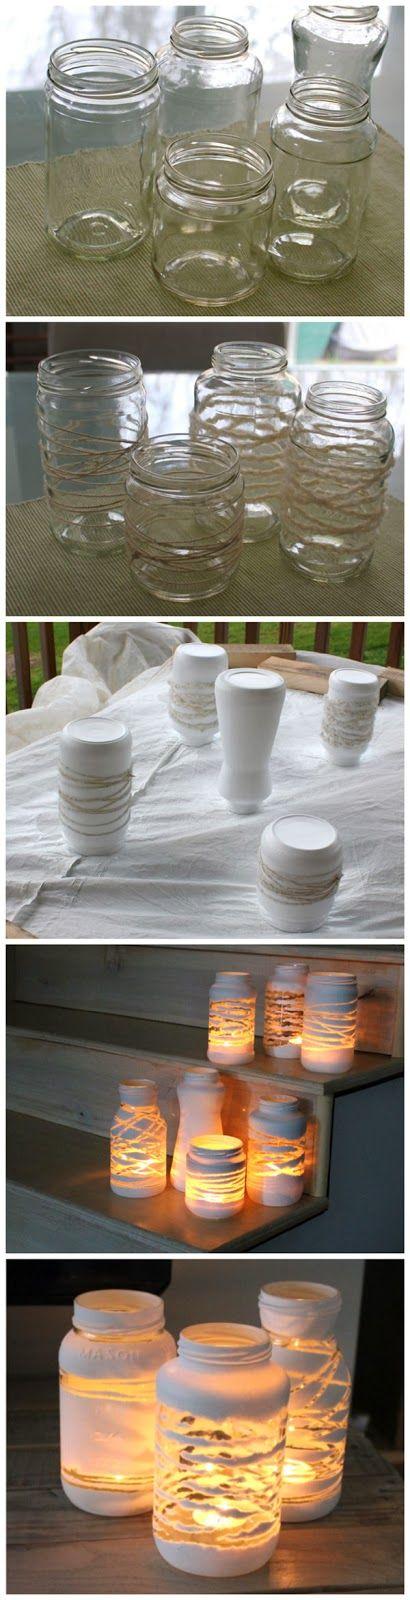 marmeladengl ser als teelicht mit faden band umwickelt angemalt yarn wrapped painted jars. Black Bedroom Furniture Sets. Home Design Ideas